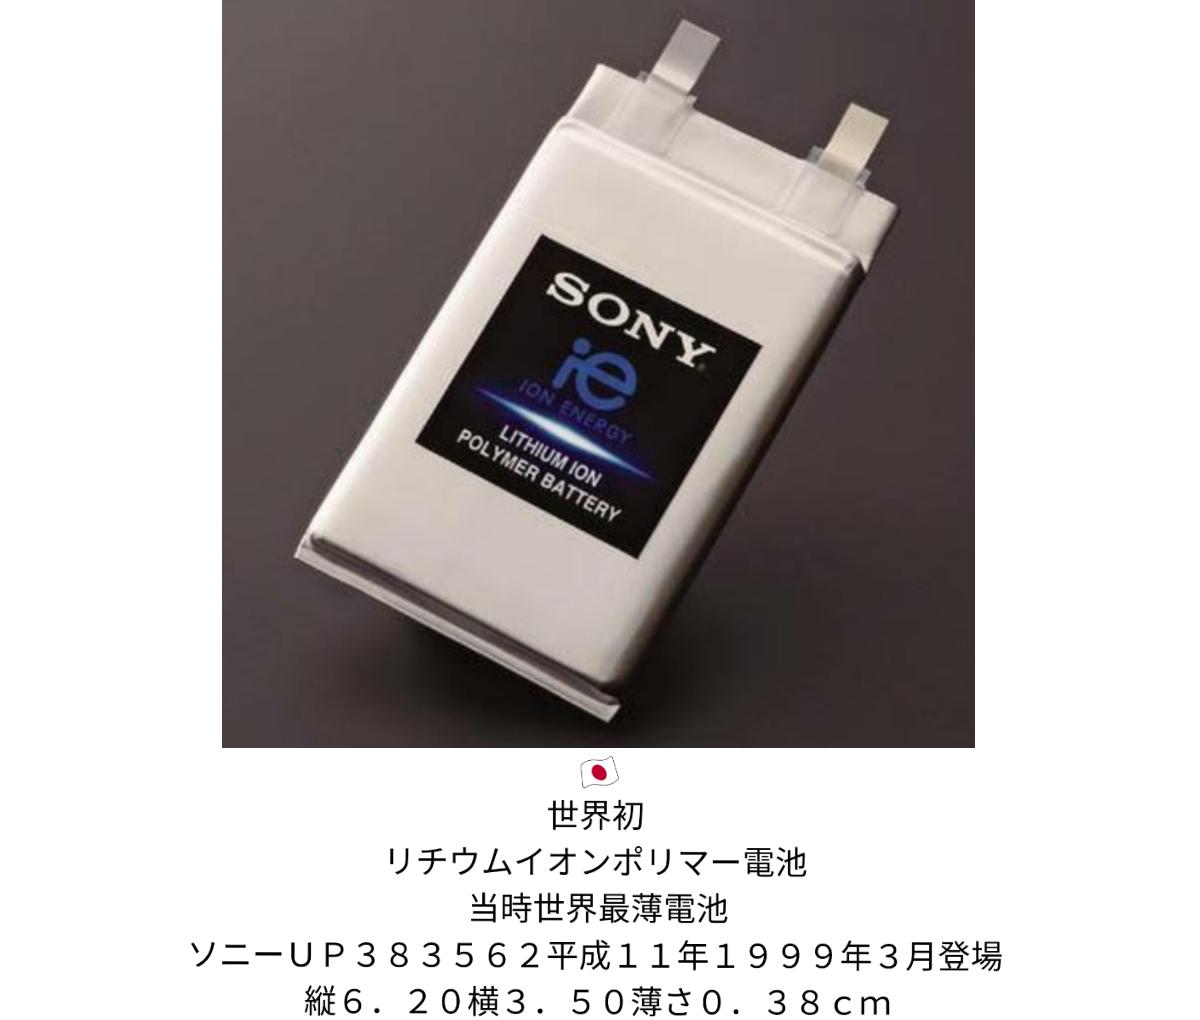 f:id:japanfather:20210417212922p:plain